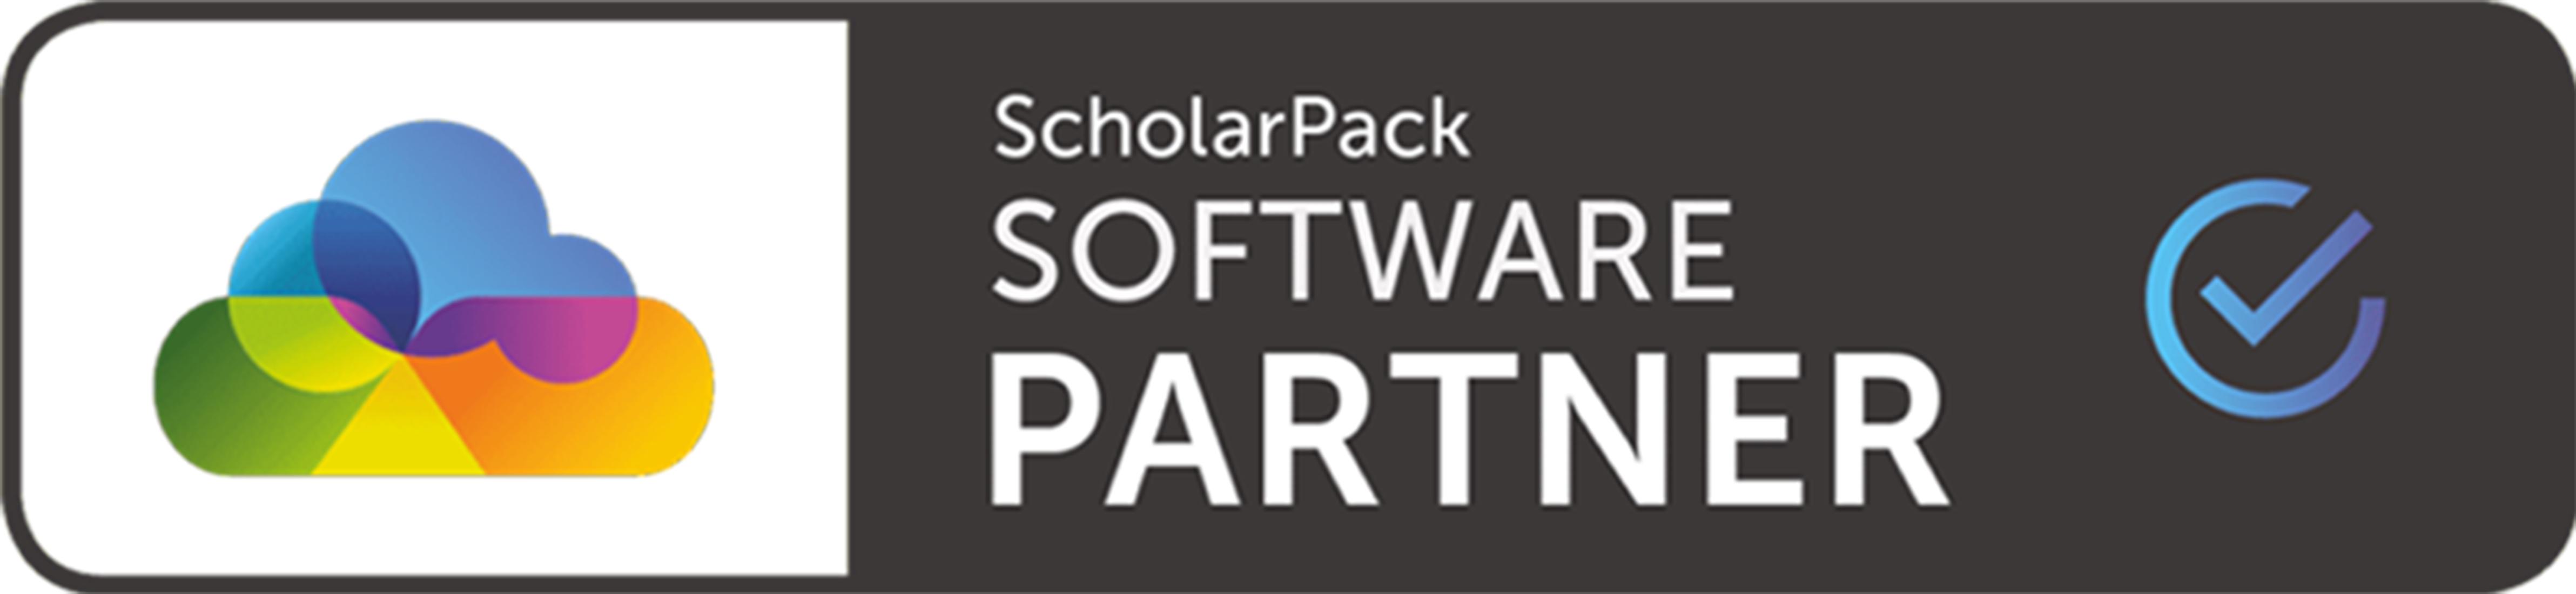 Scholar Pack